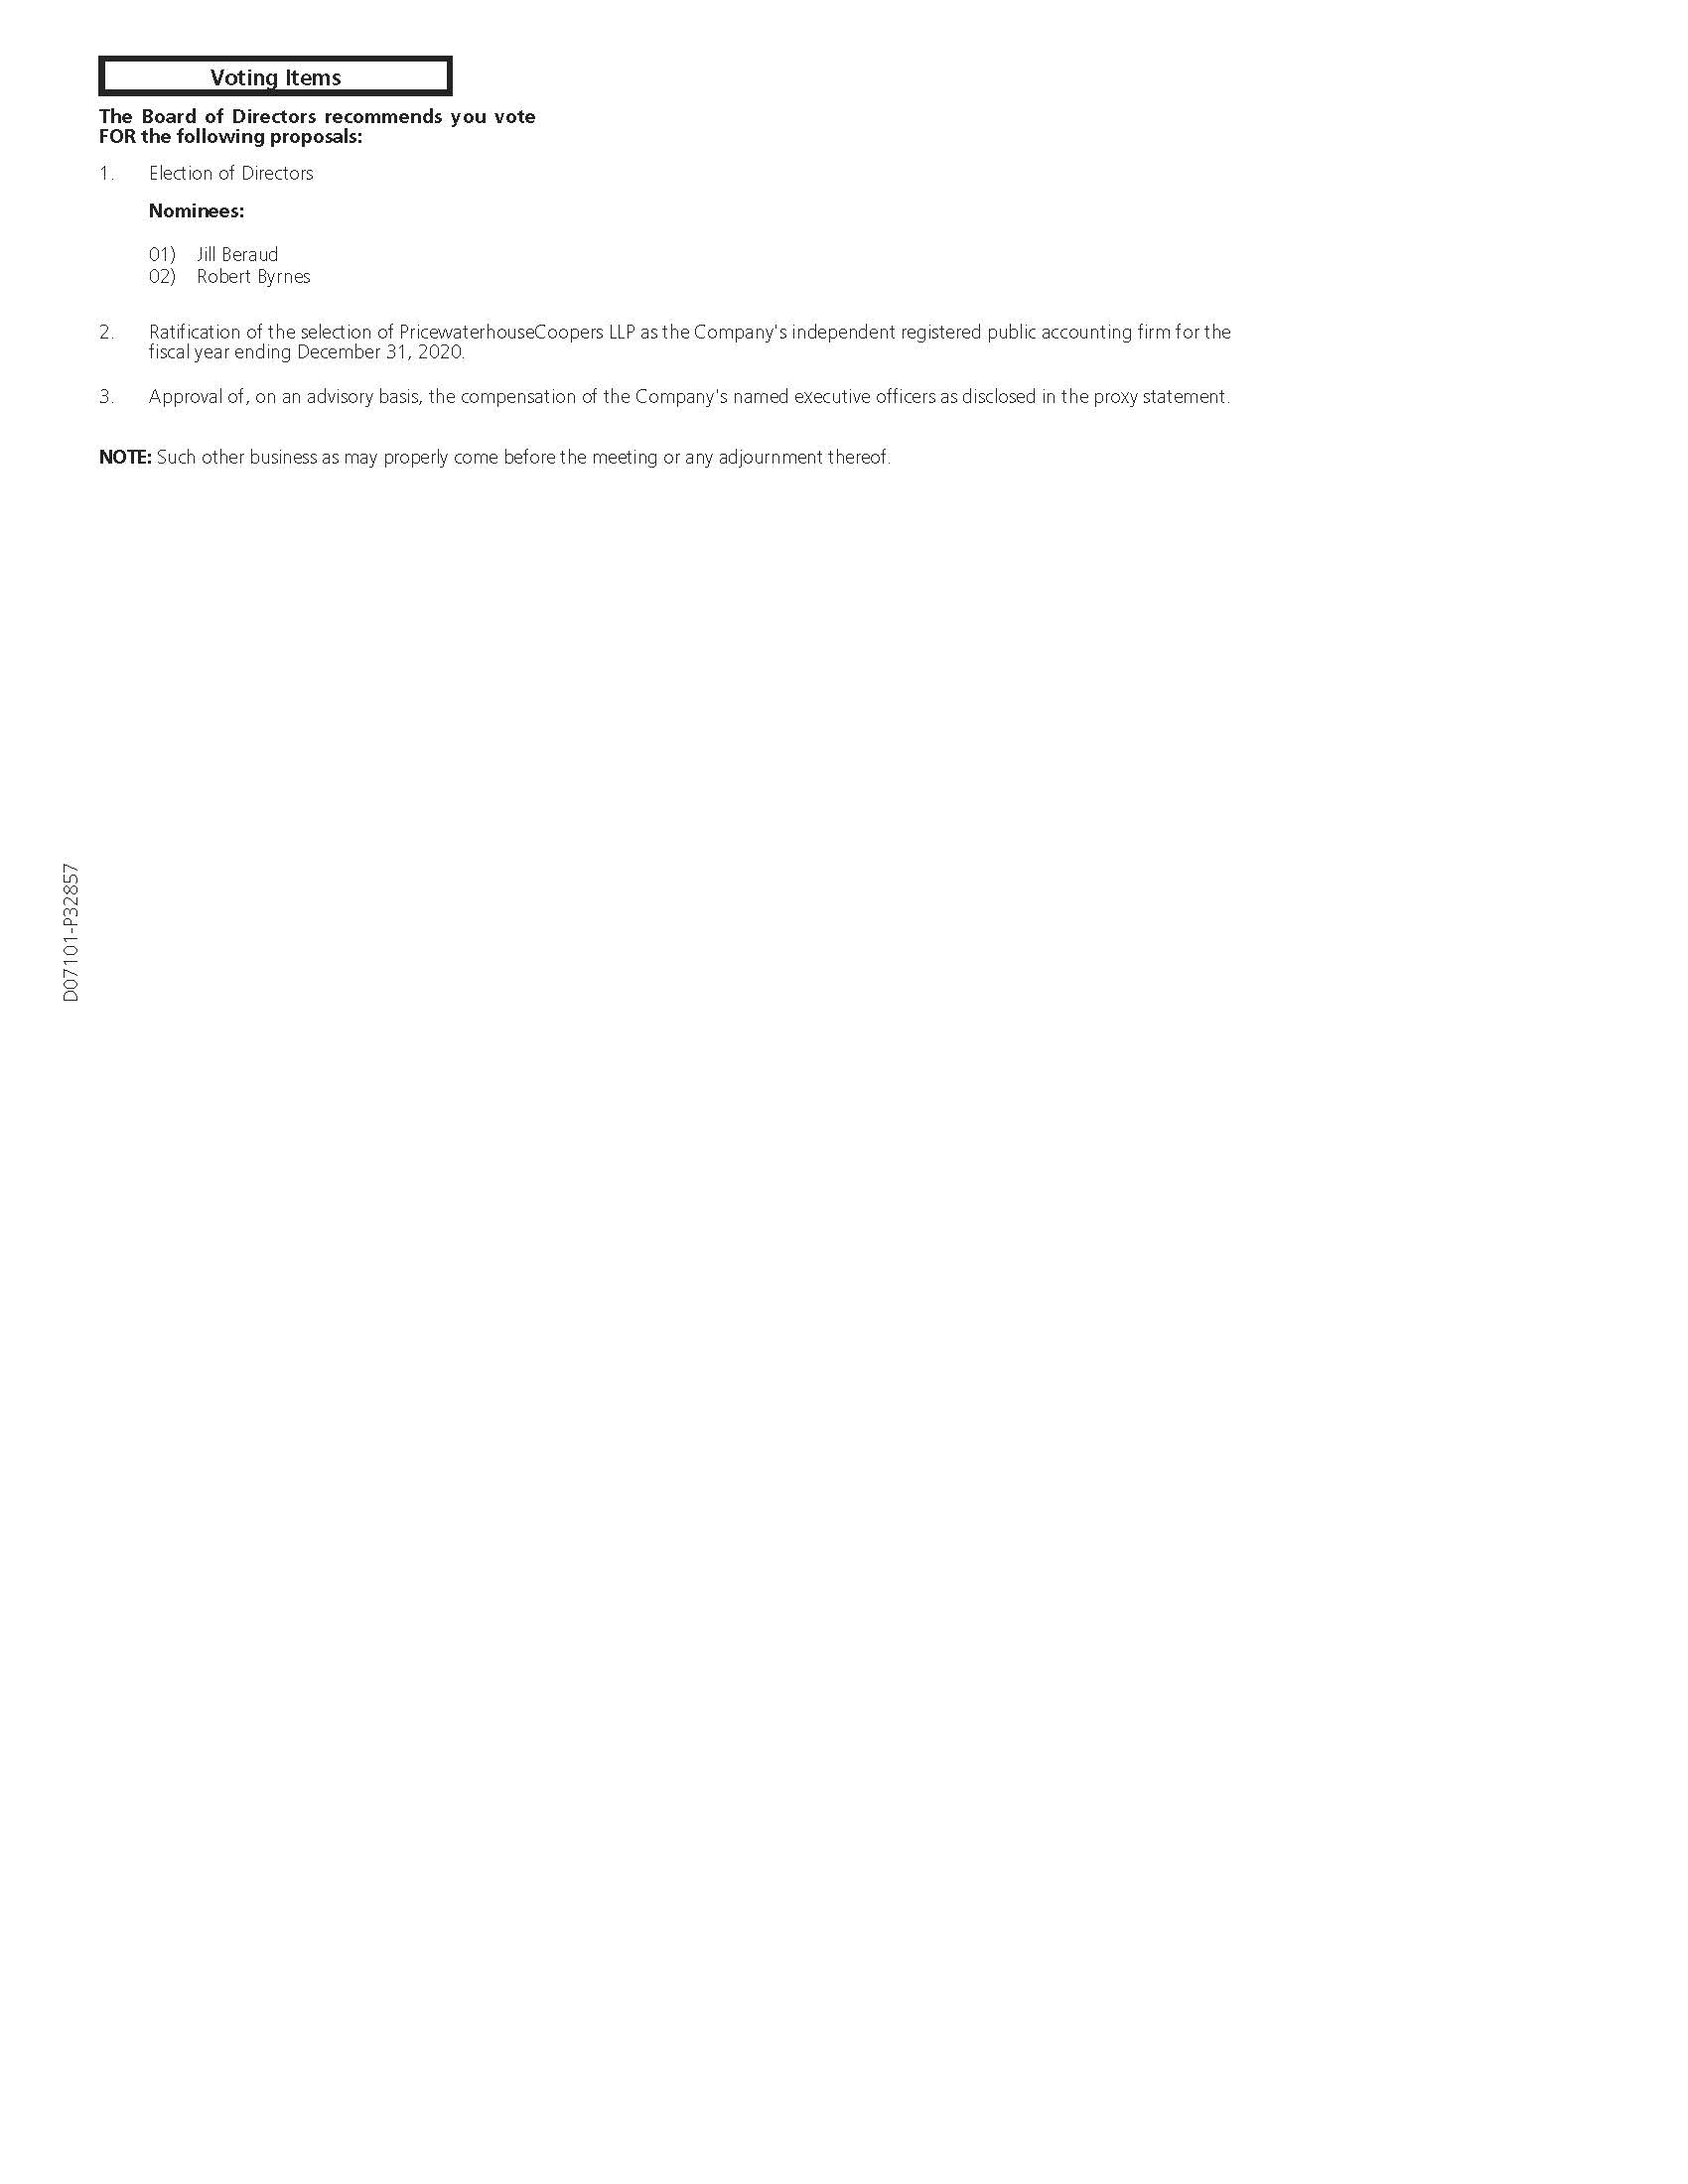 https://cdn.kscope.io/1f609accbb4bd3a8aa587da92fb76f63-revance2020proxynoticepage3.jpg